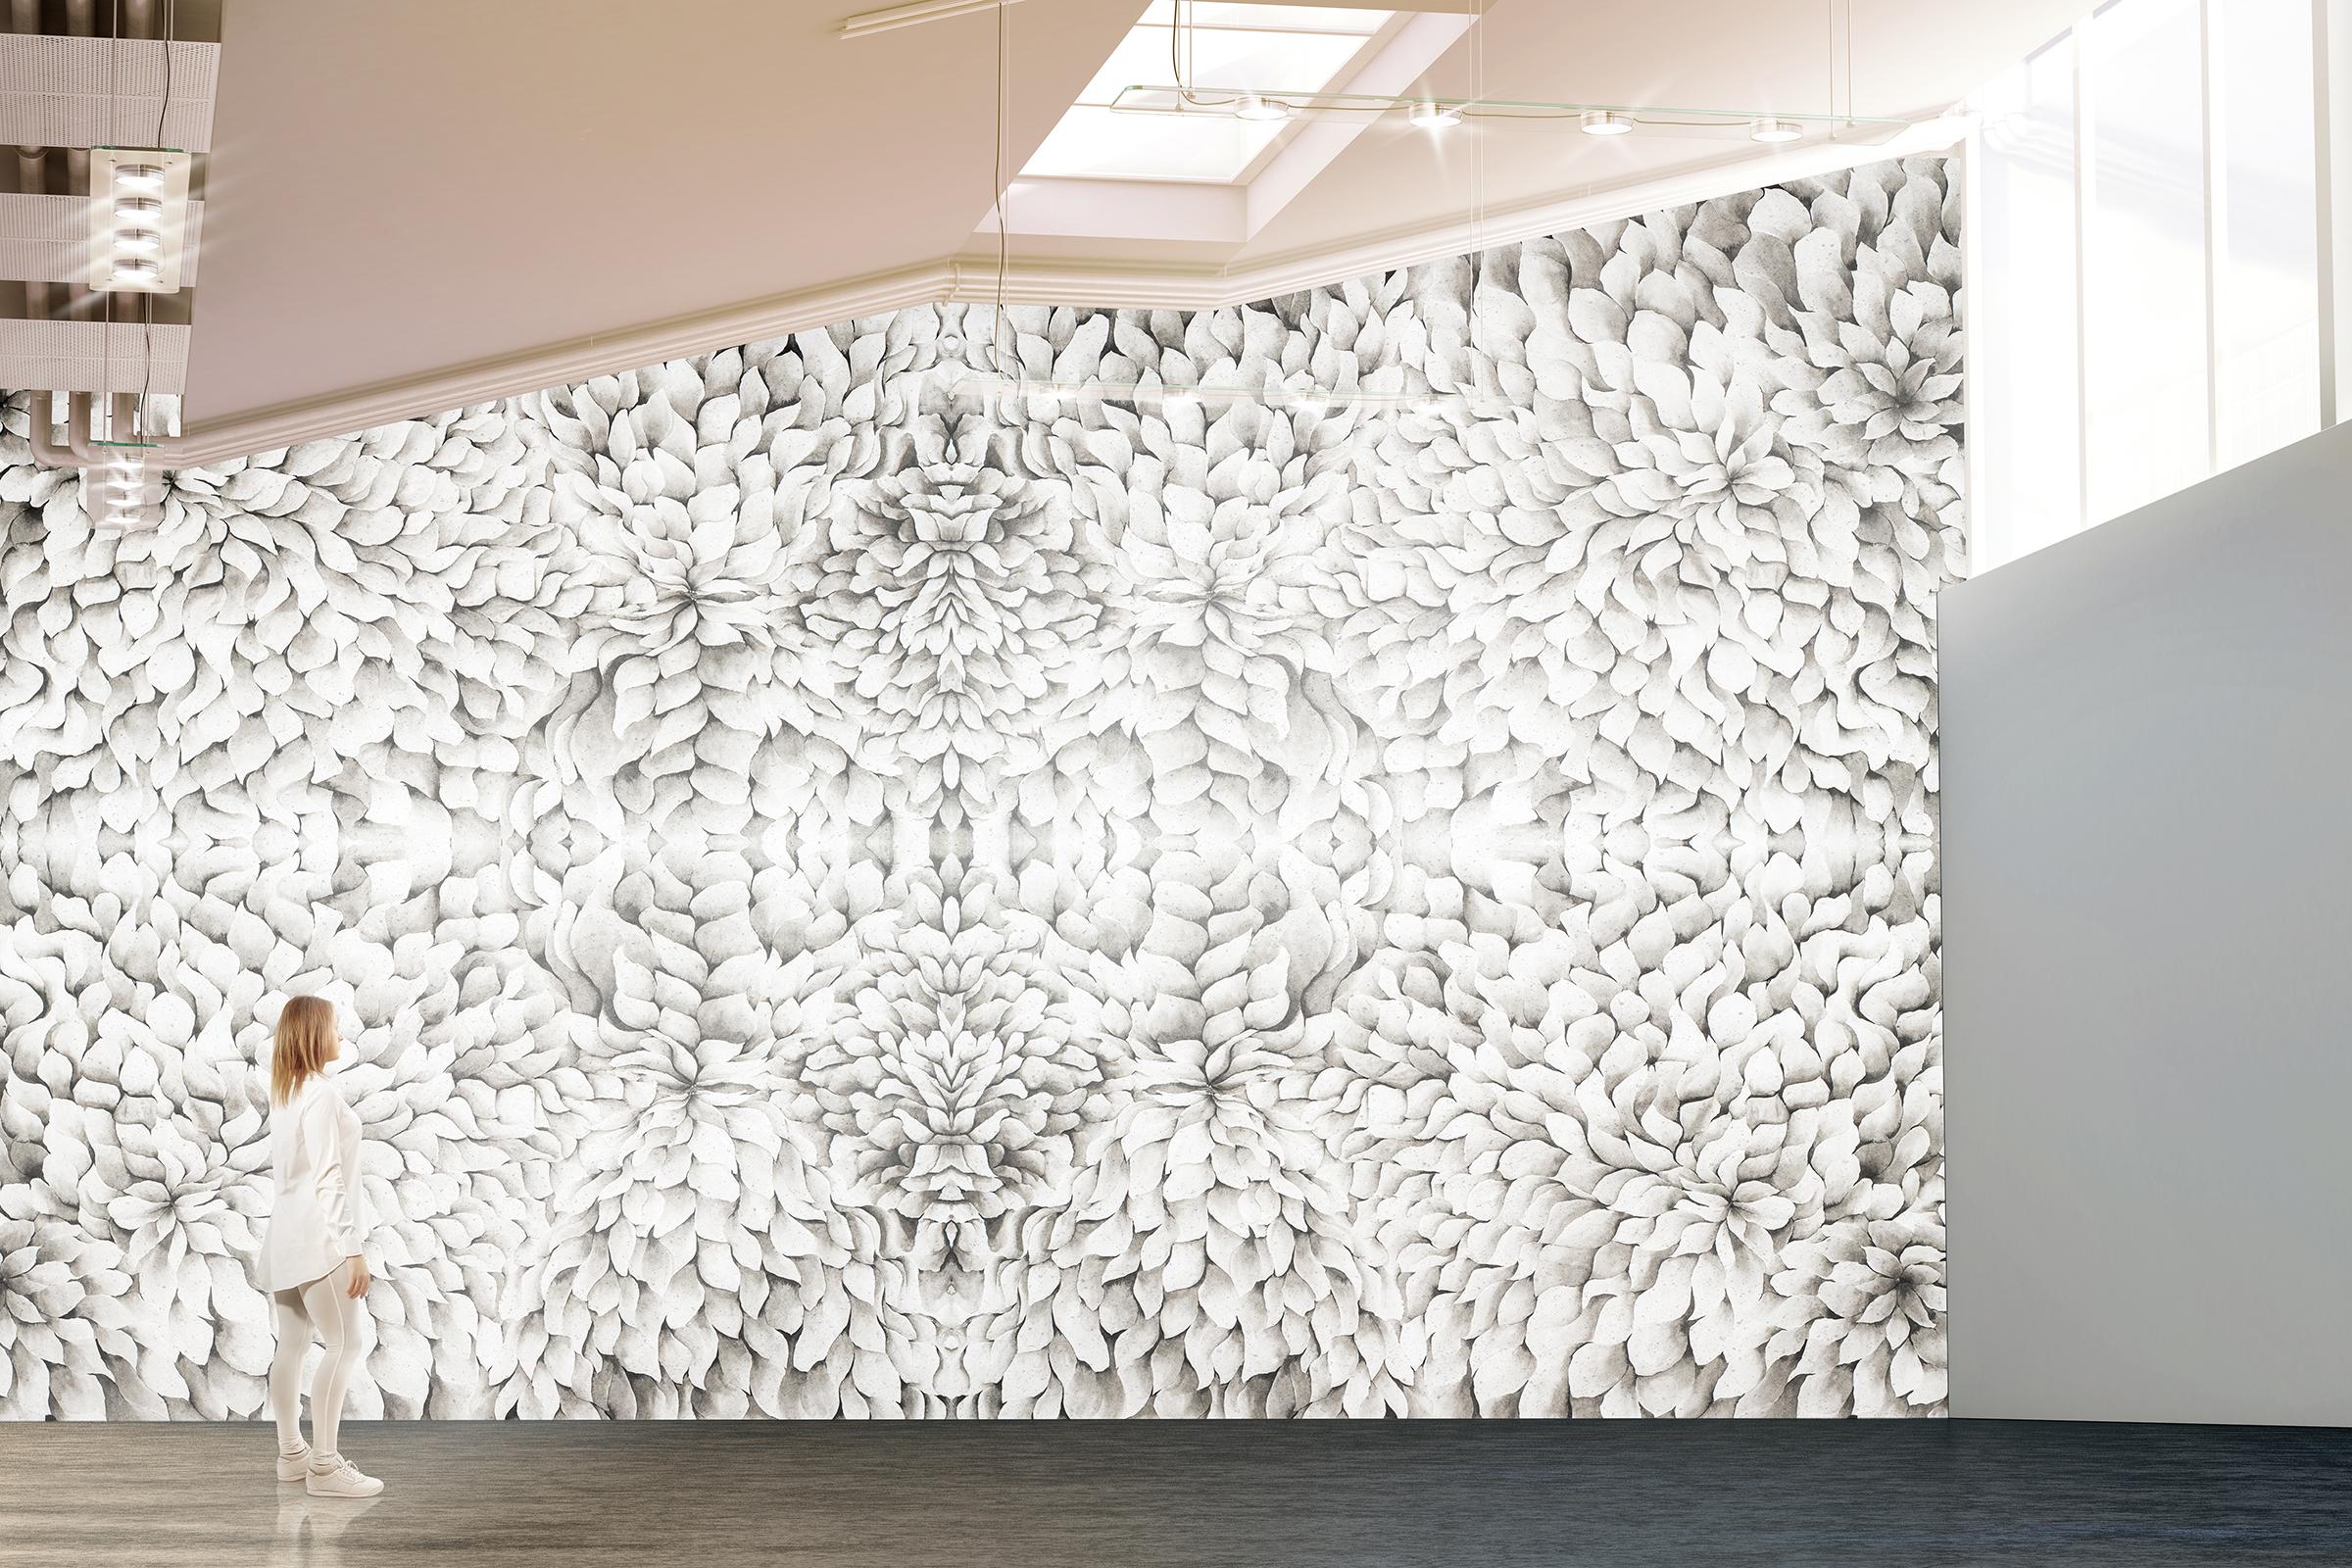 Black and White Chrysanthemum Wall Paper